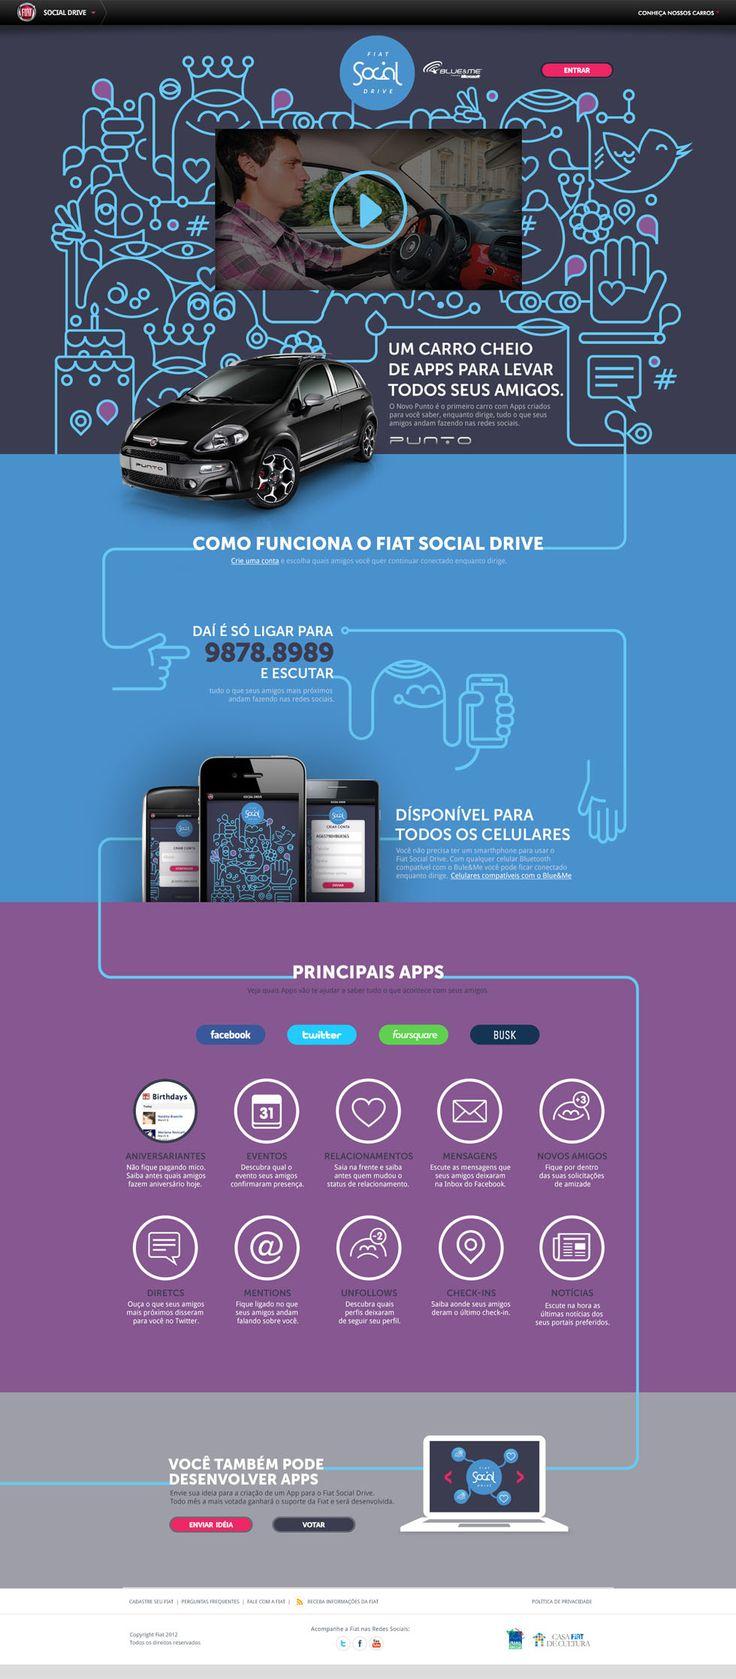 Social Drive - Bruno Oyama - Interactive Designer & Art Director